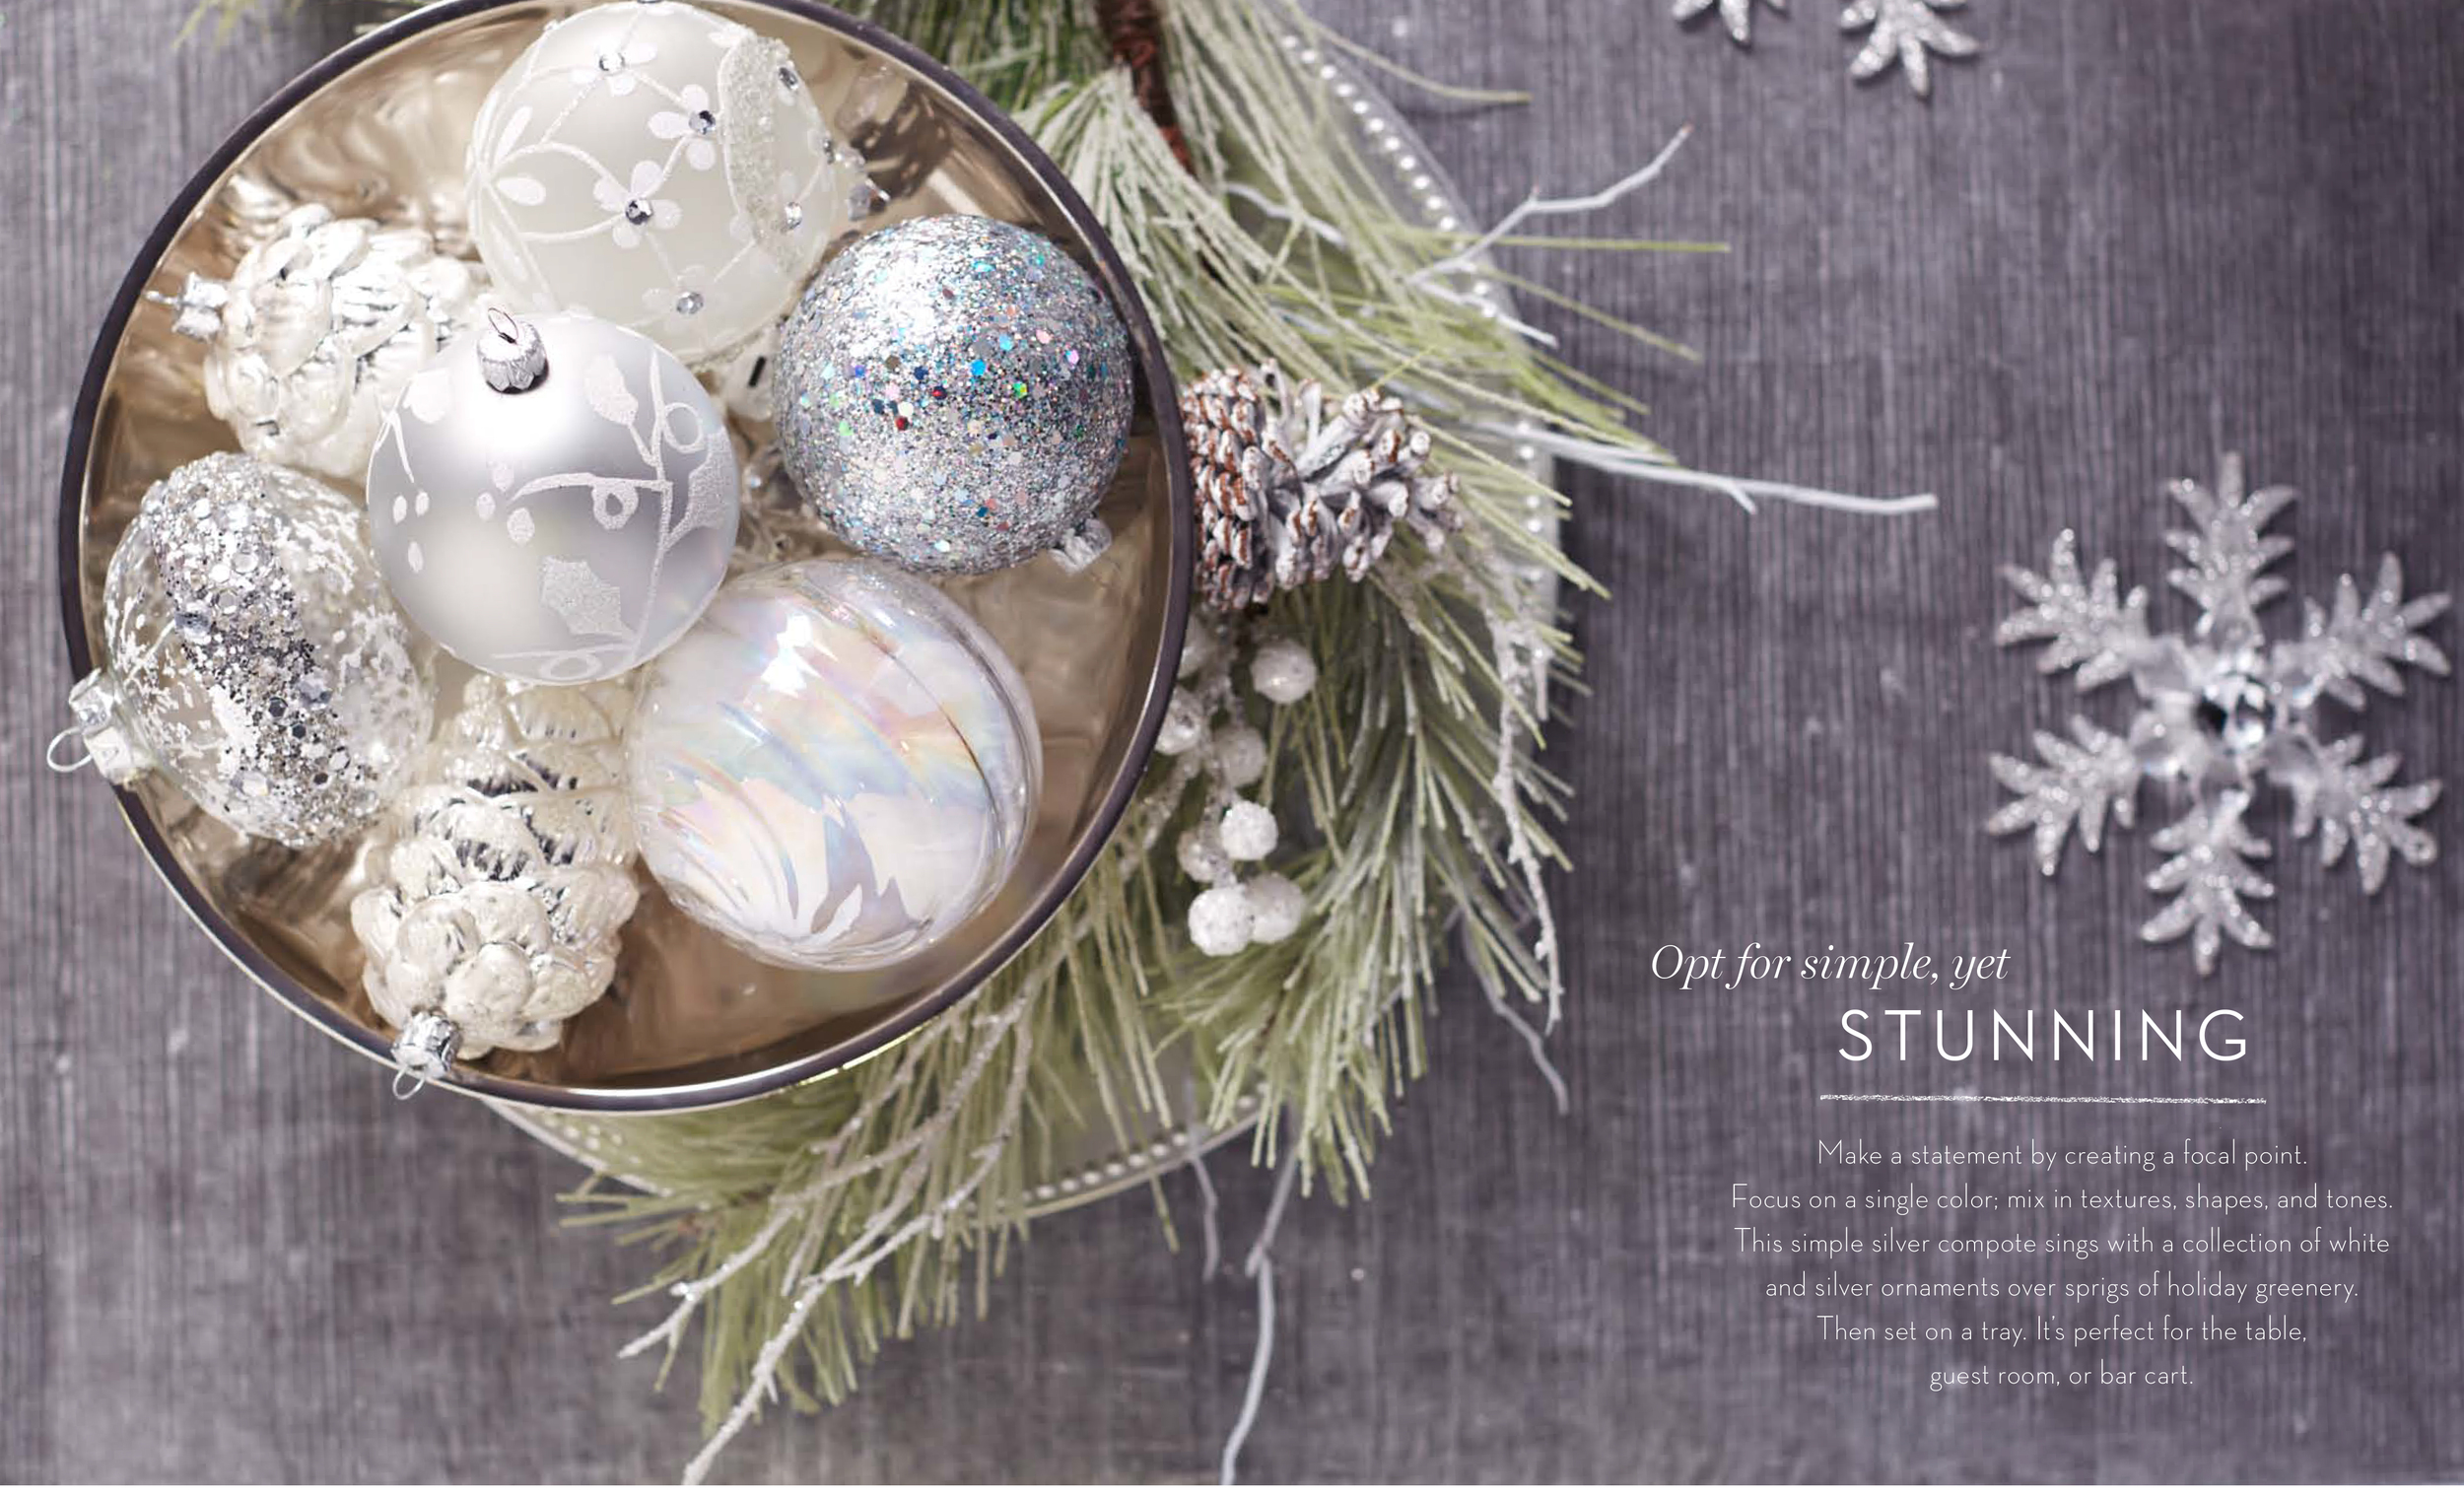 LB_0005_RueLaLaLiving_Ornaments7[3] 6.jpg